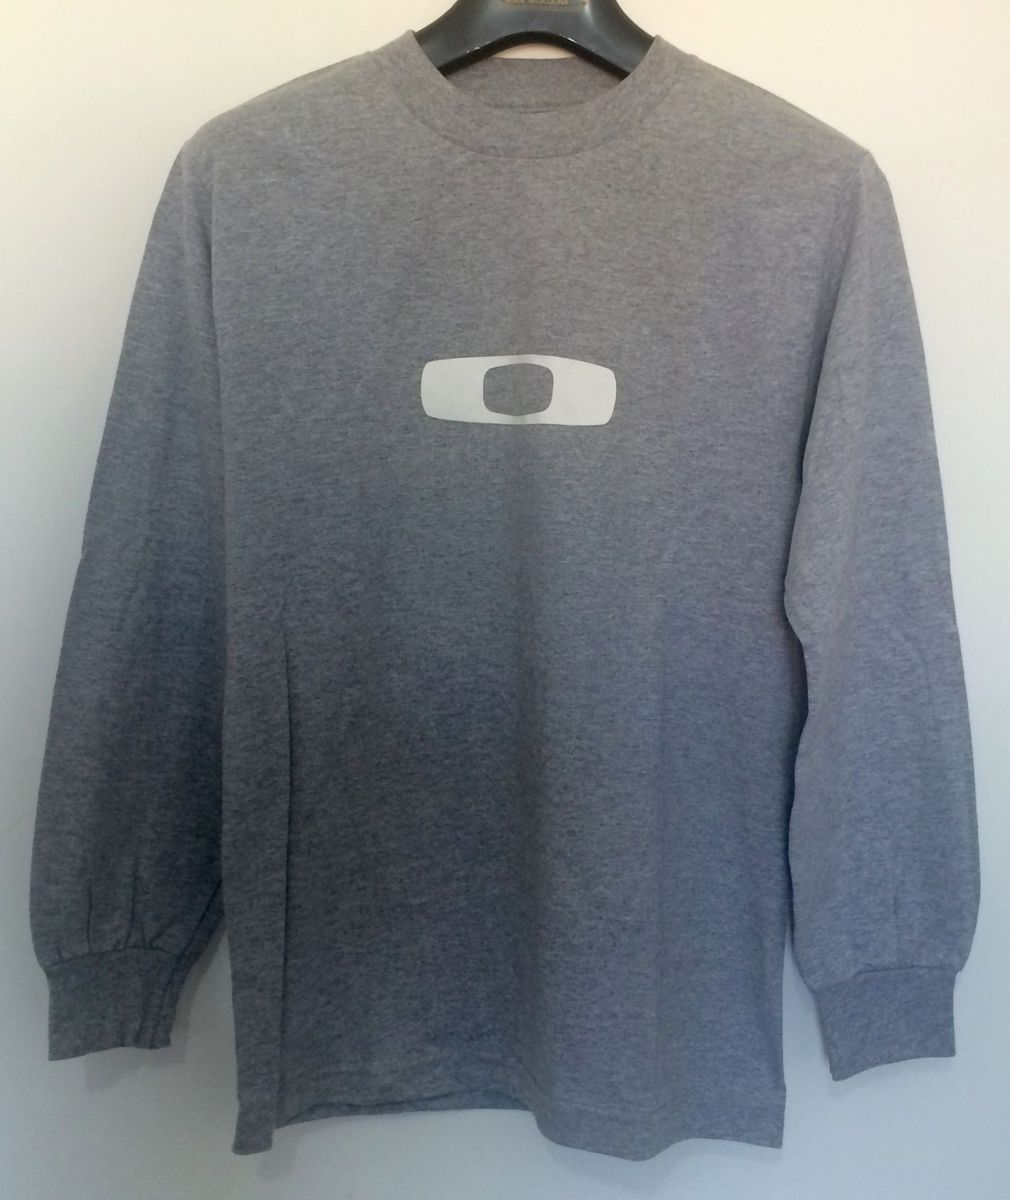 camiseta oakley manga longa importada - casacos oakley d53c0eb3033